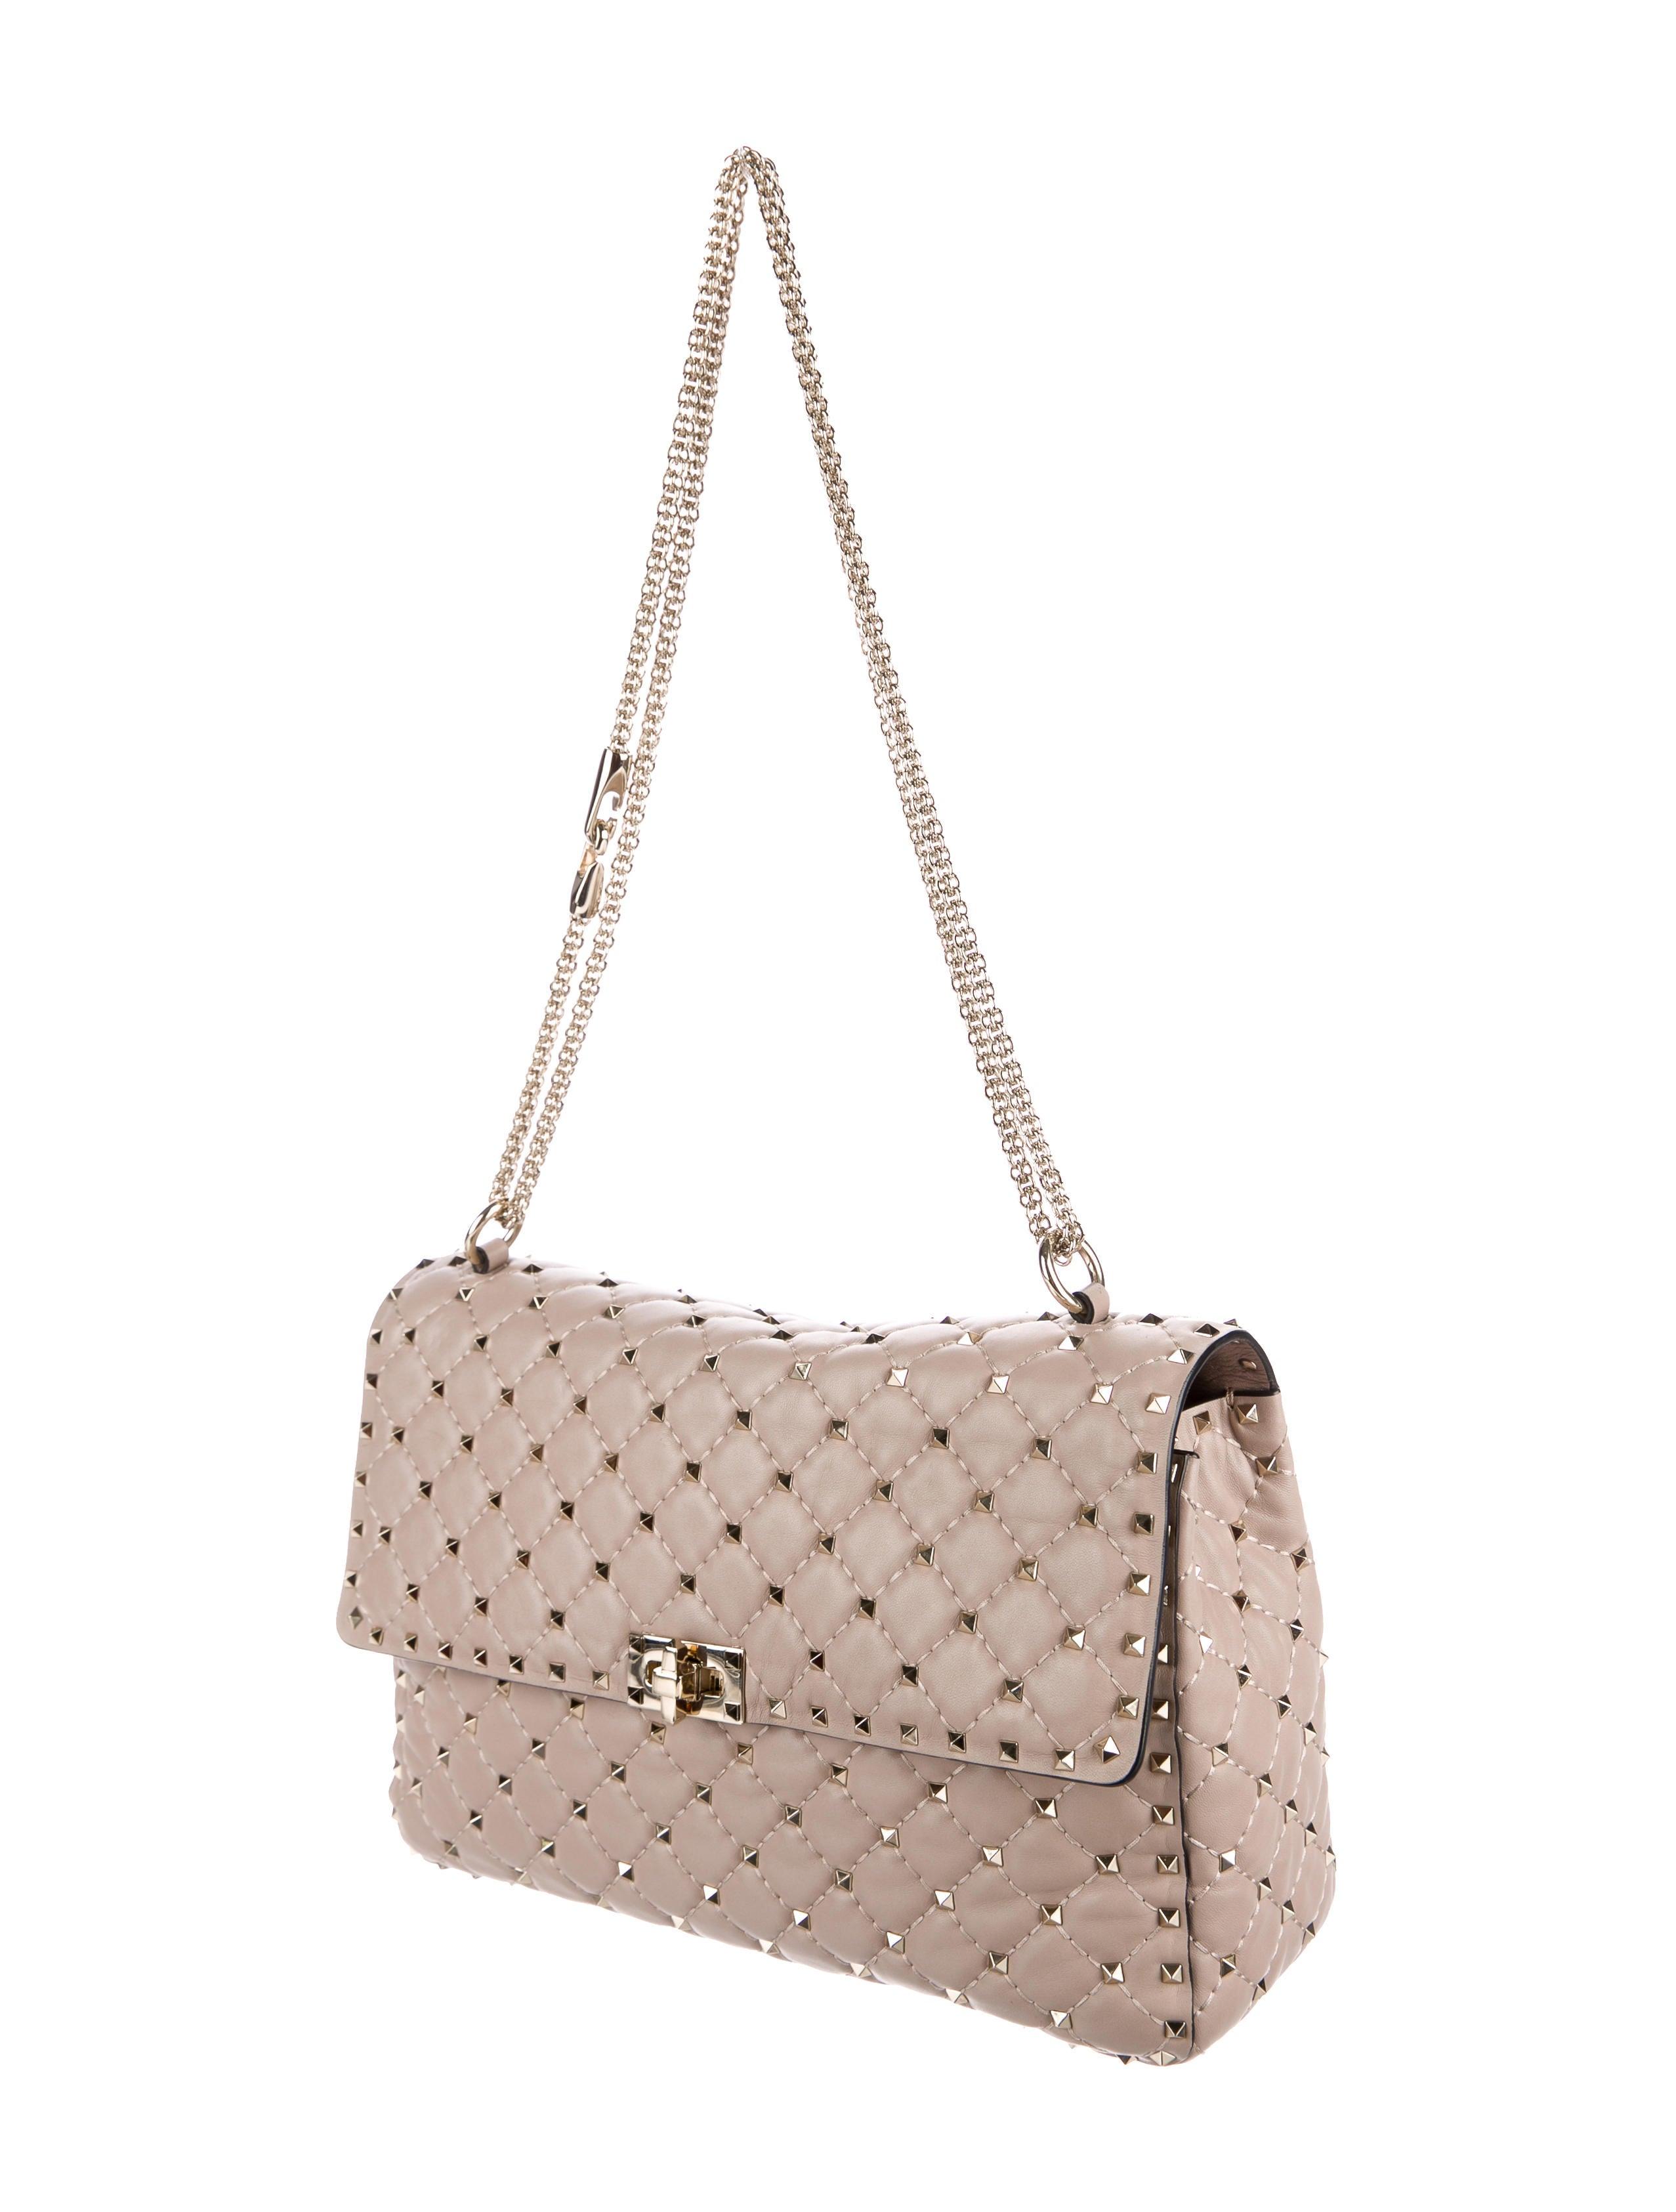 Valentino 2017 Rockstud Spike Chain Bag Handbags